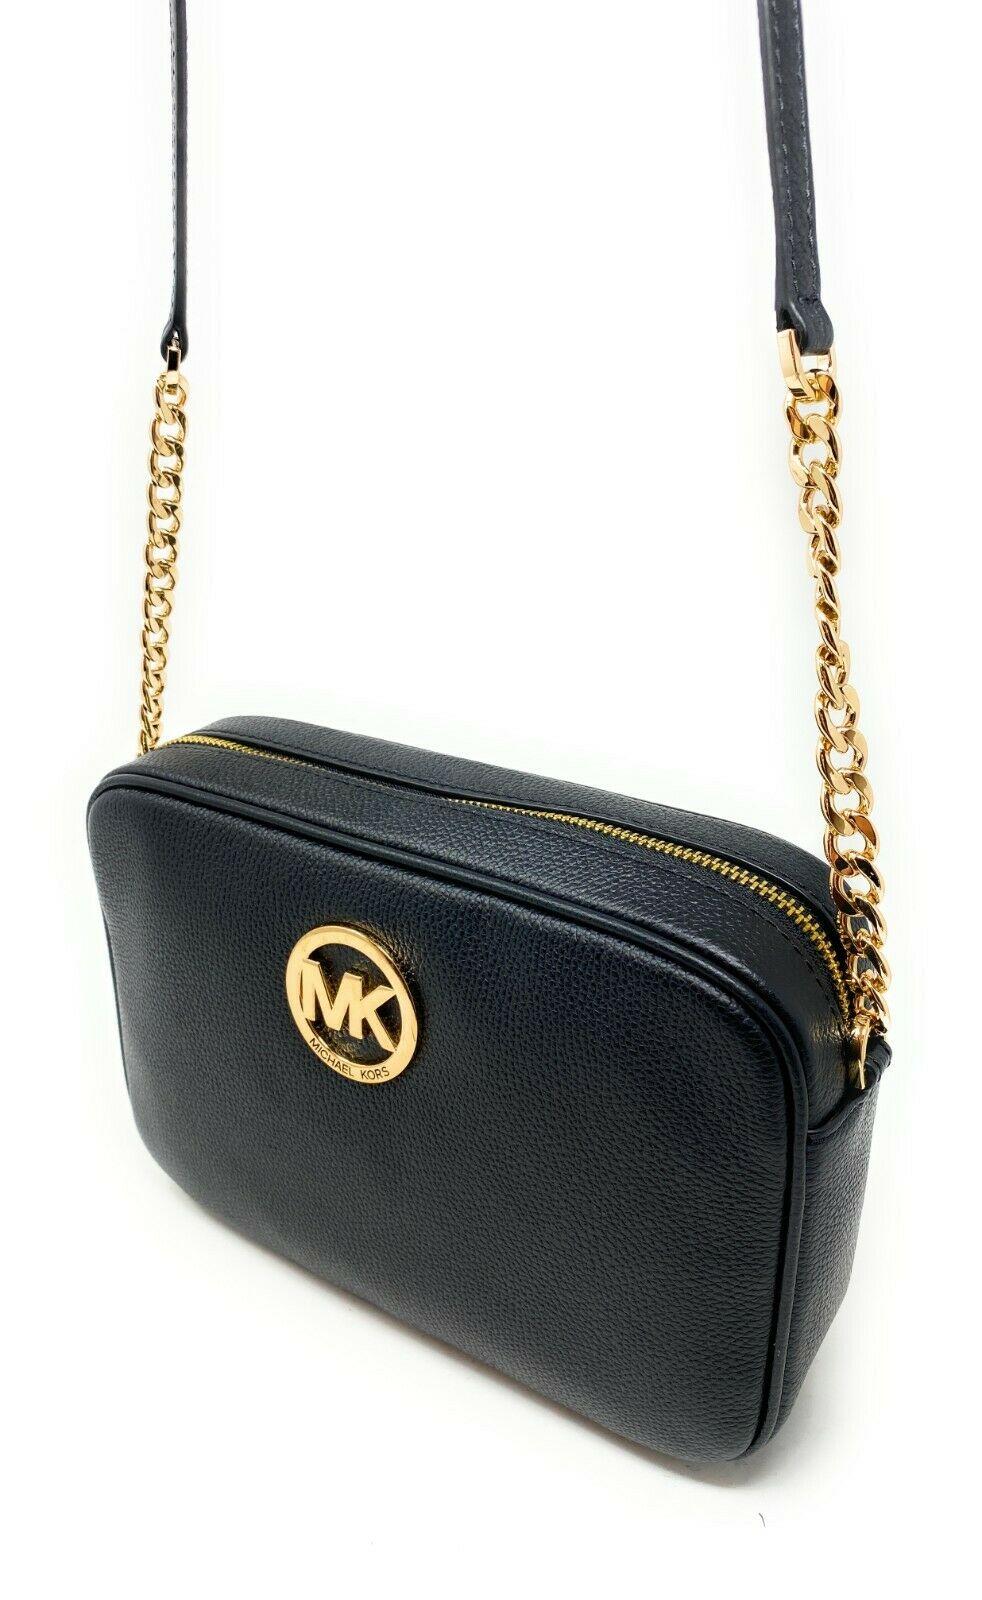 thumbnail 93 - Michael Kors Jet Set Item Large East West Crossbody Chain Handbag Clutch $298